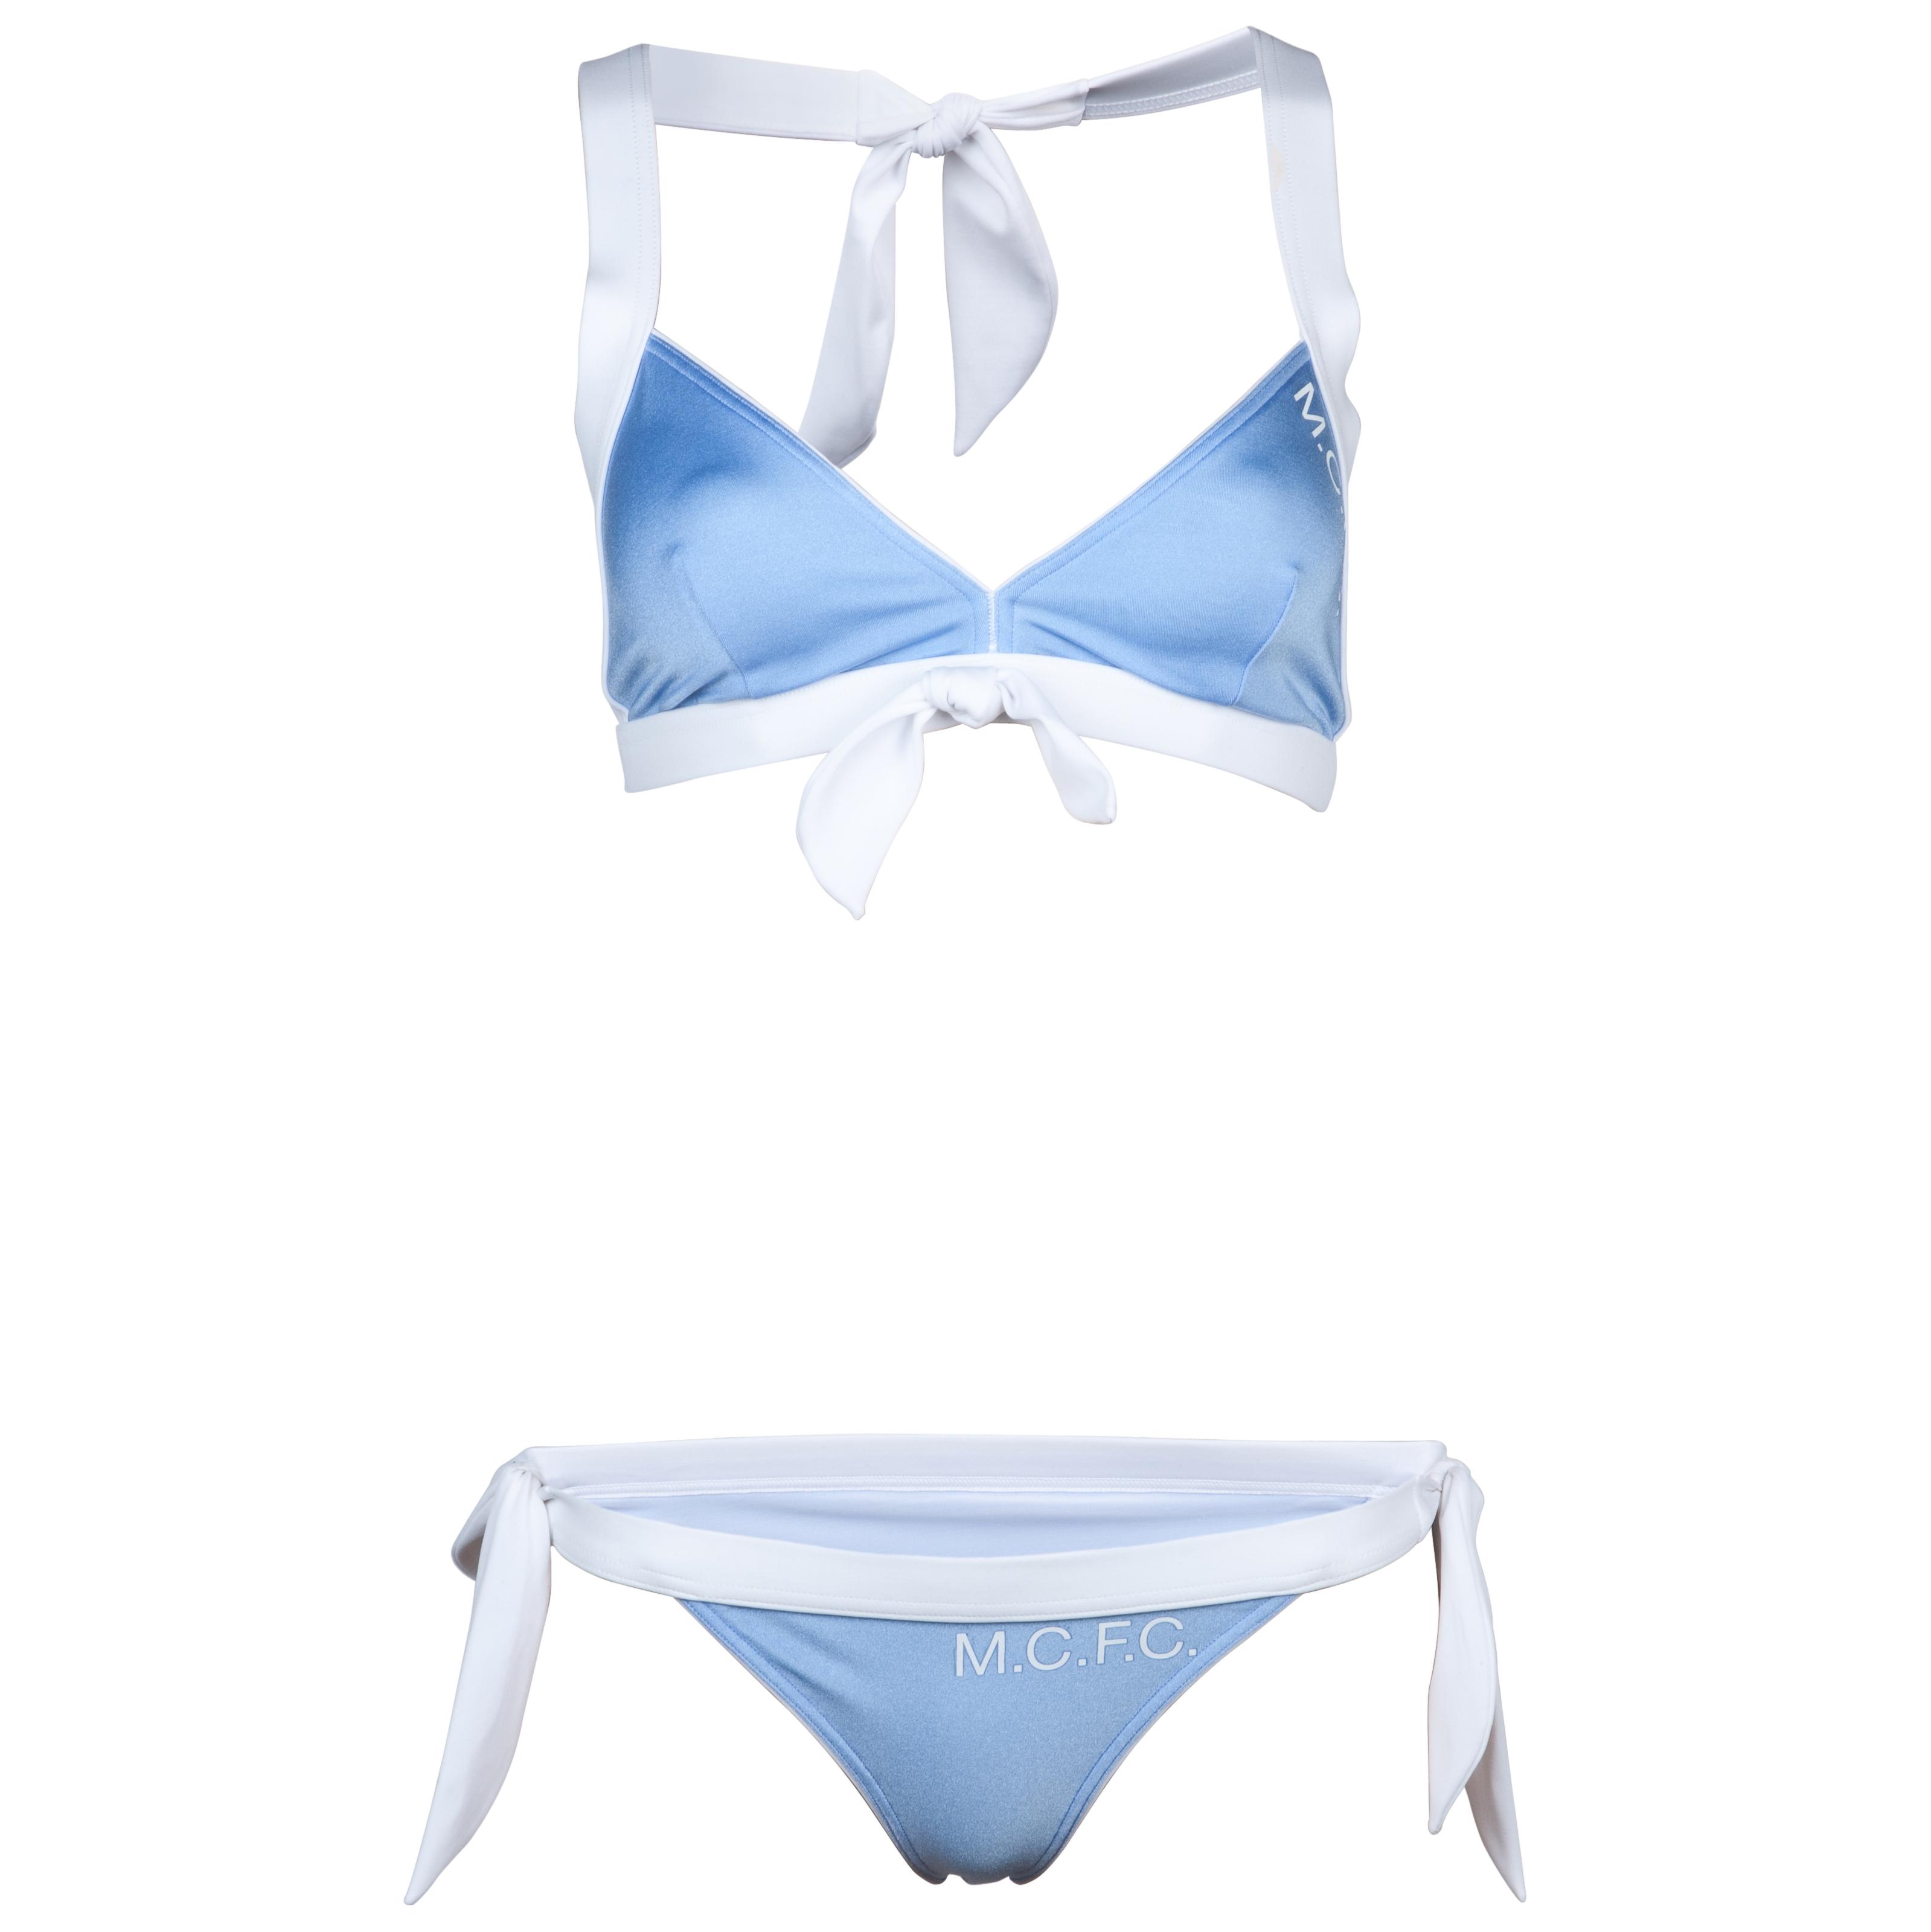 Manchester City Bikini - Sky/White - Womens